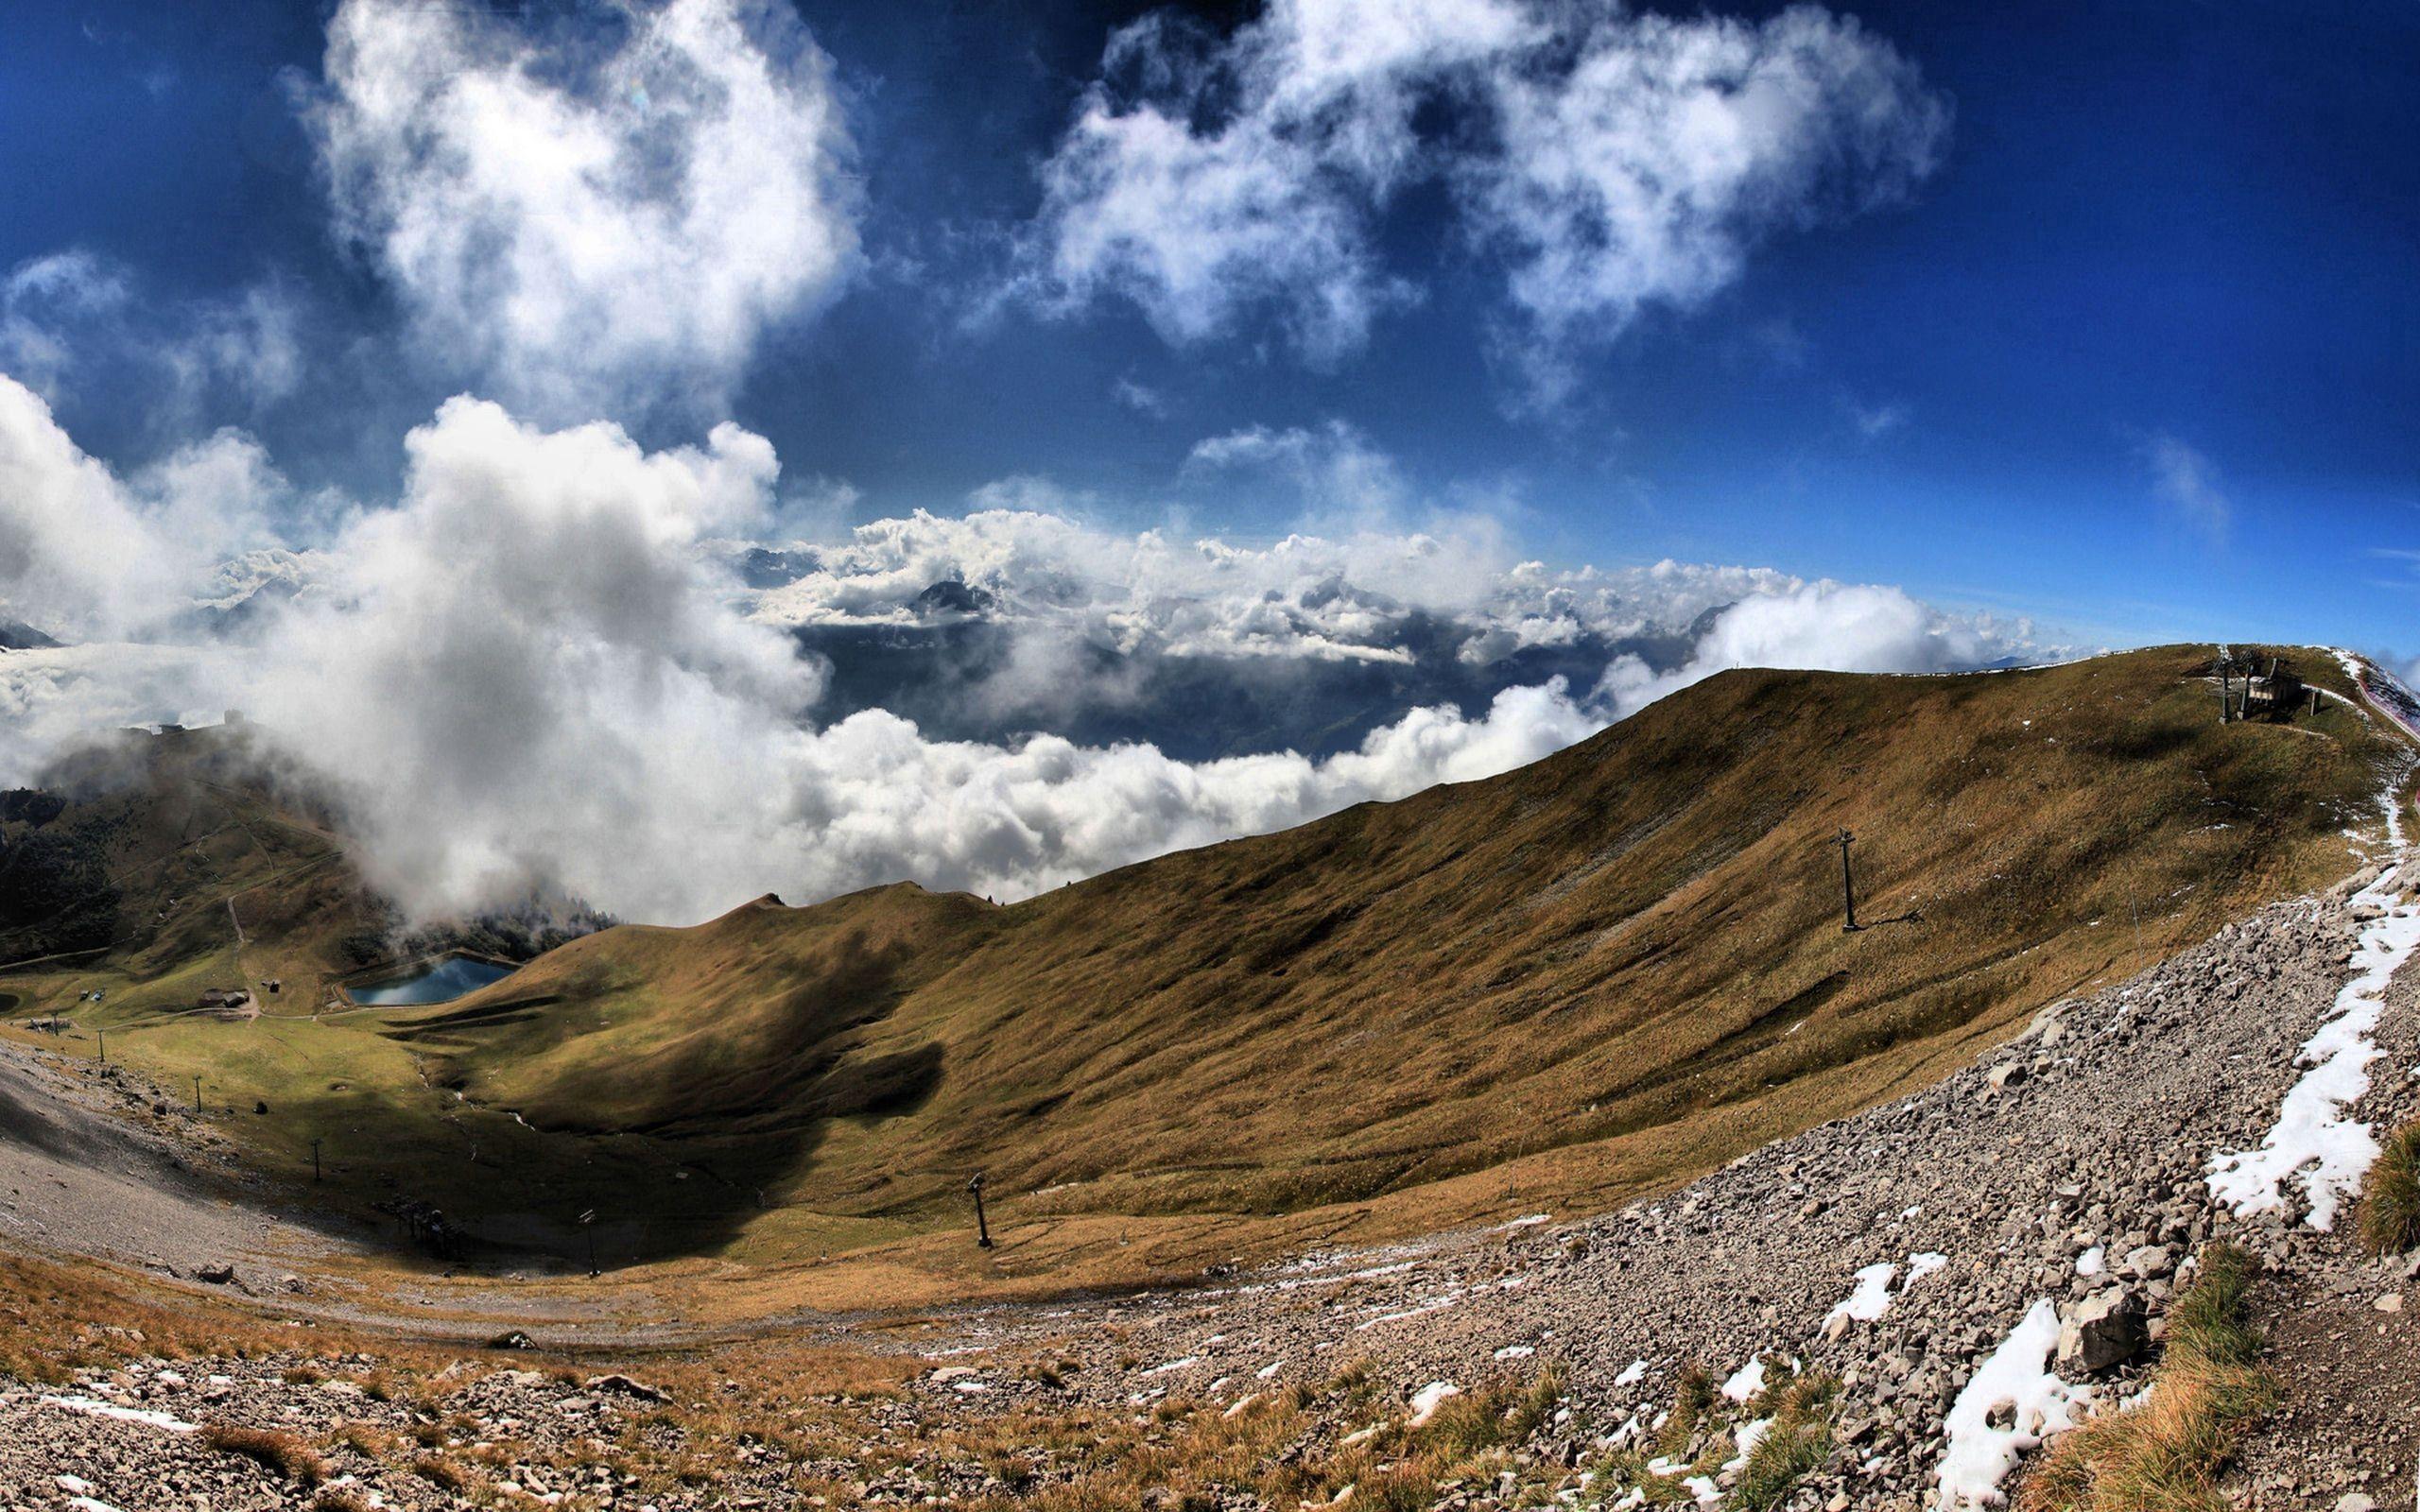 148362 Заставки и Обои Облака на телефон. Скачать Природа, Трава, Небо, Облака, Туман, Горы картинки бесплатно